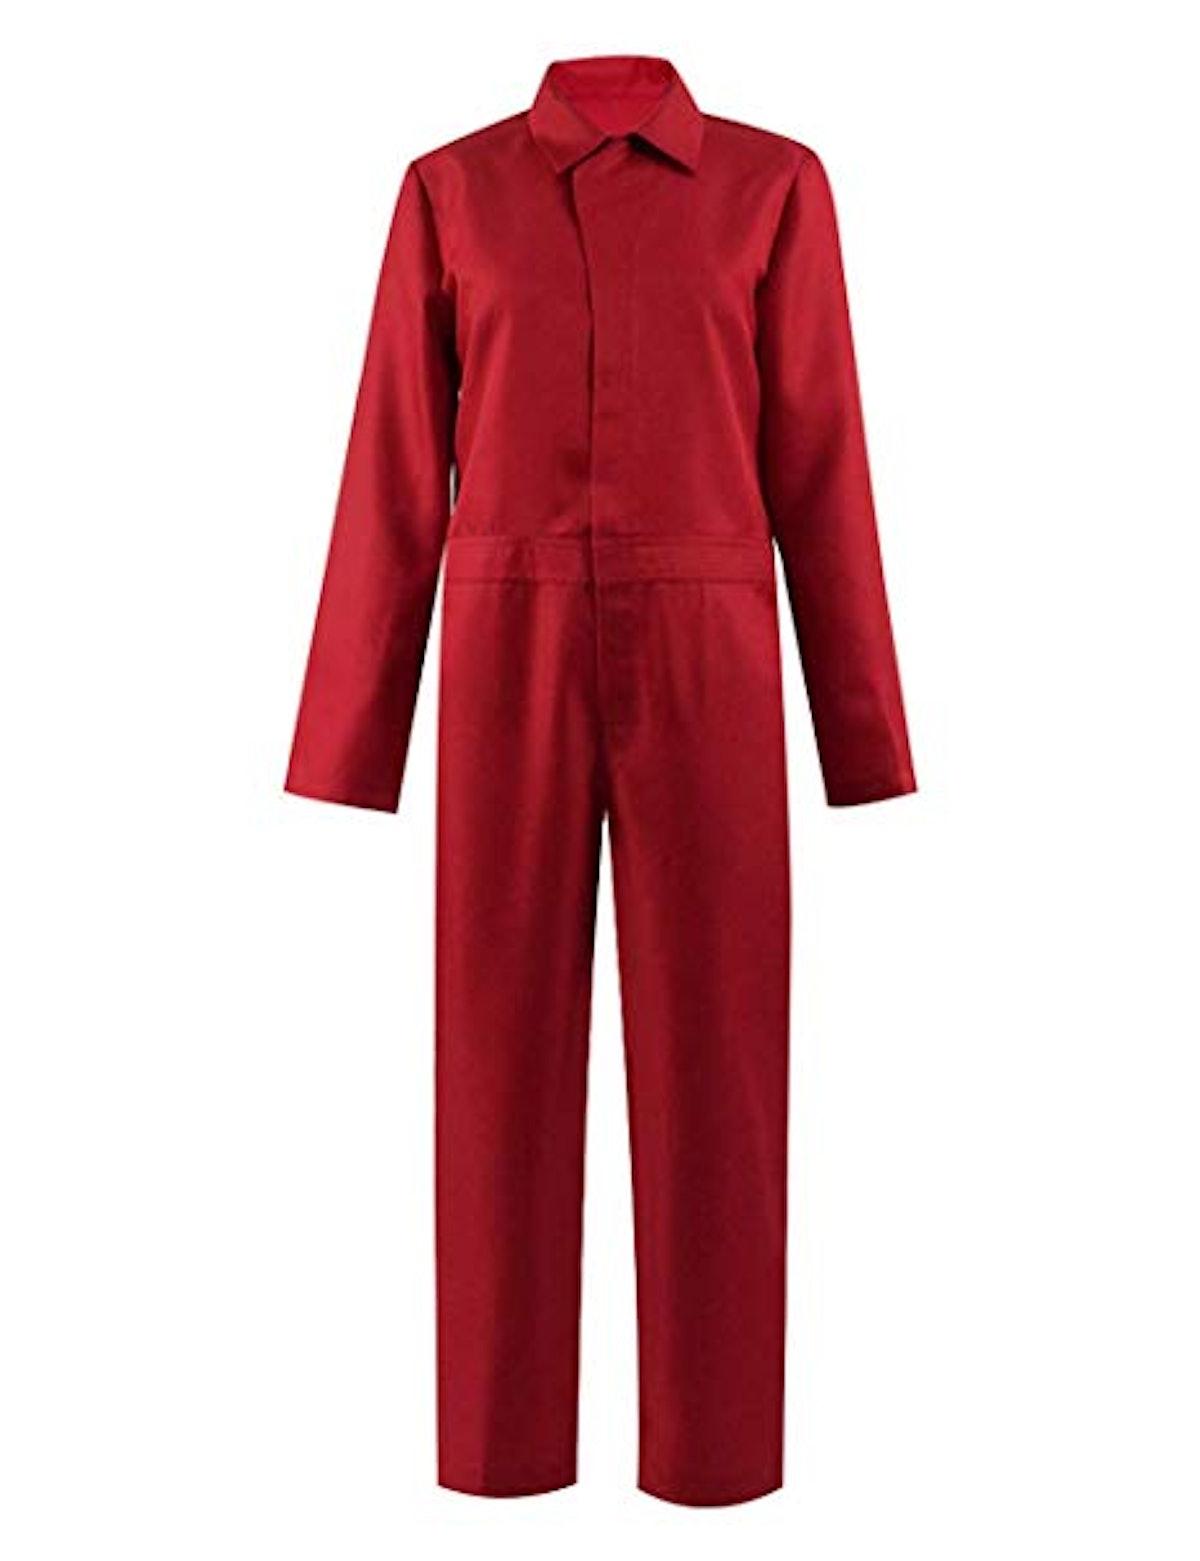 Us Adelaide Costume red Jumpsuit for Men/Women Halloween Costume Cosplay